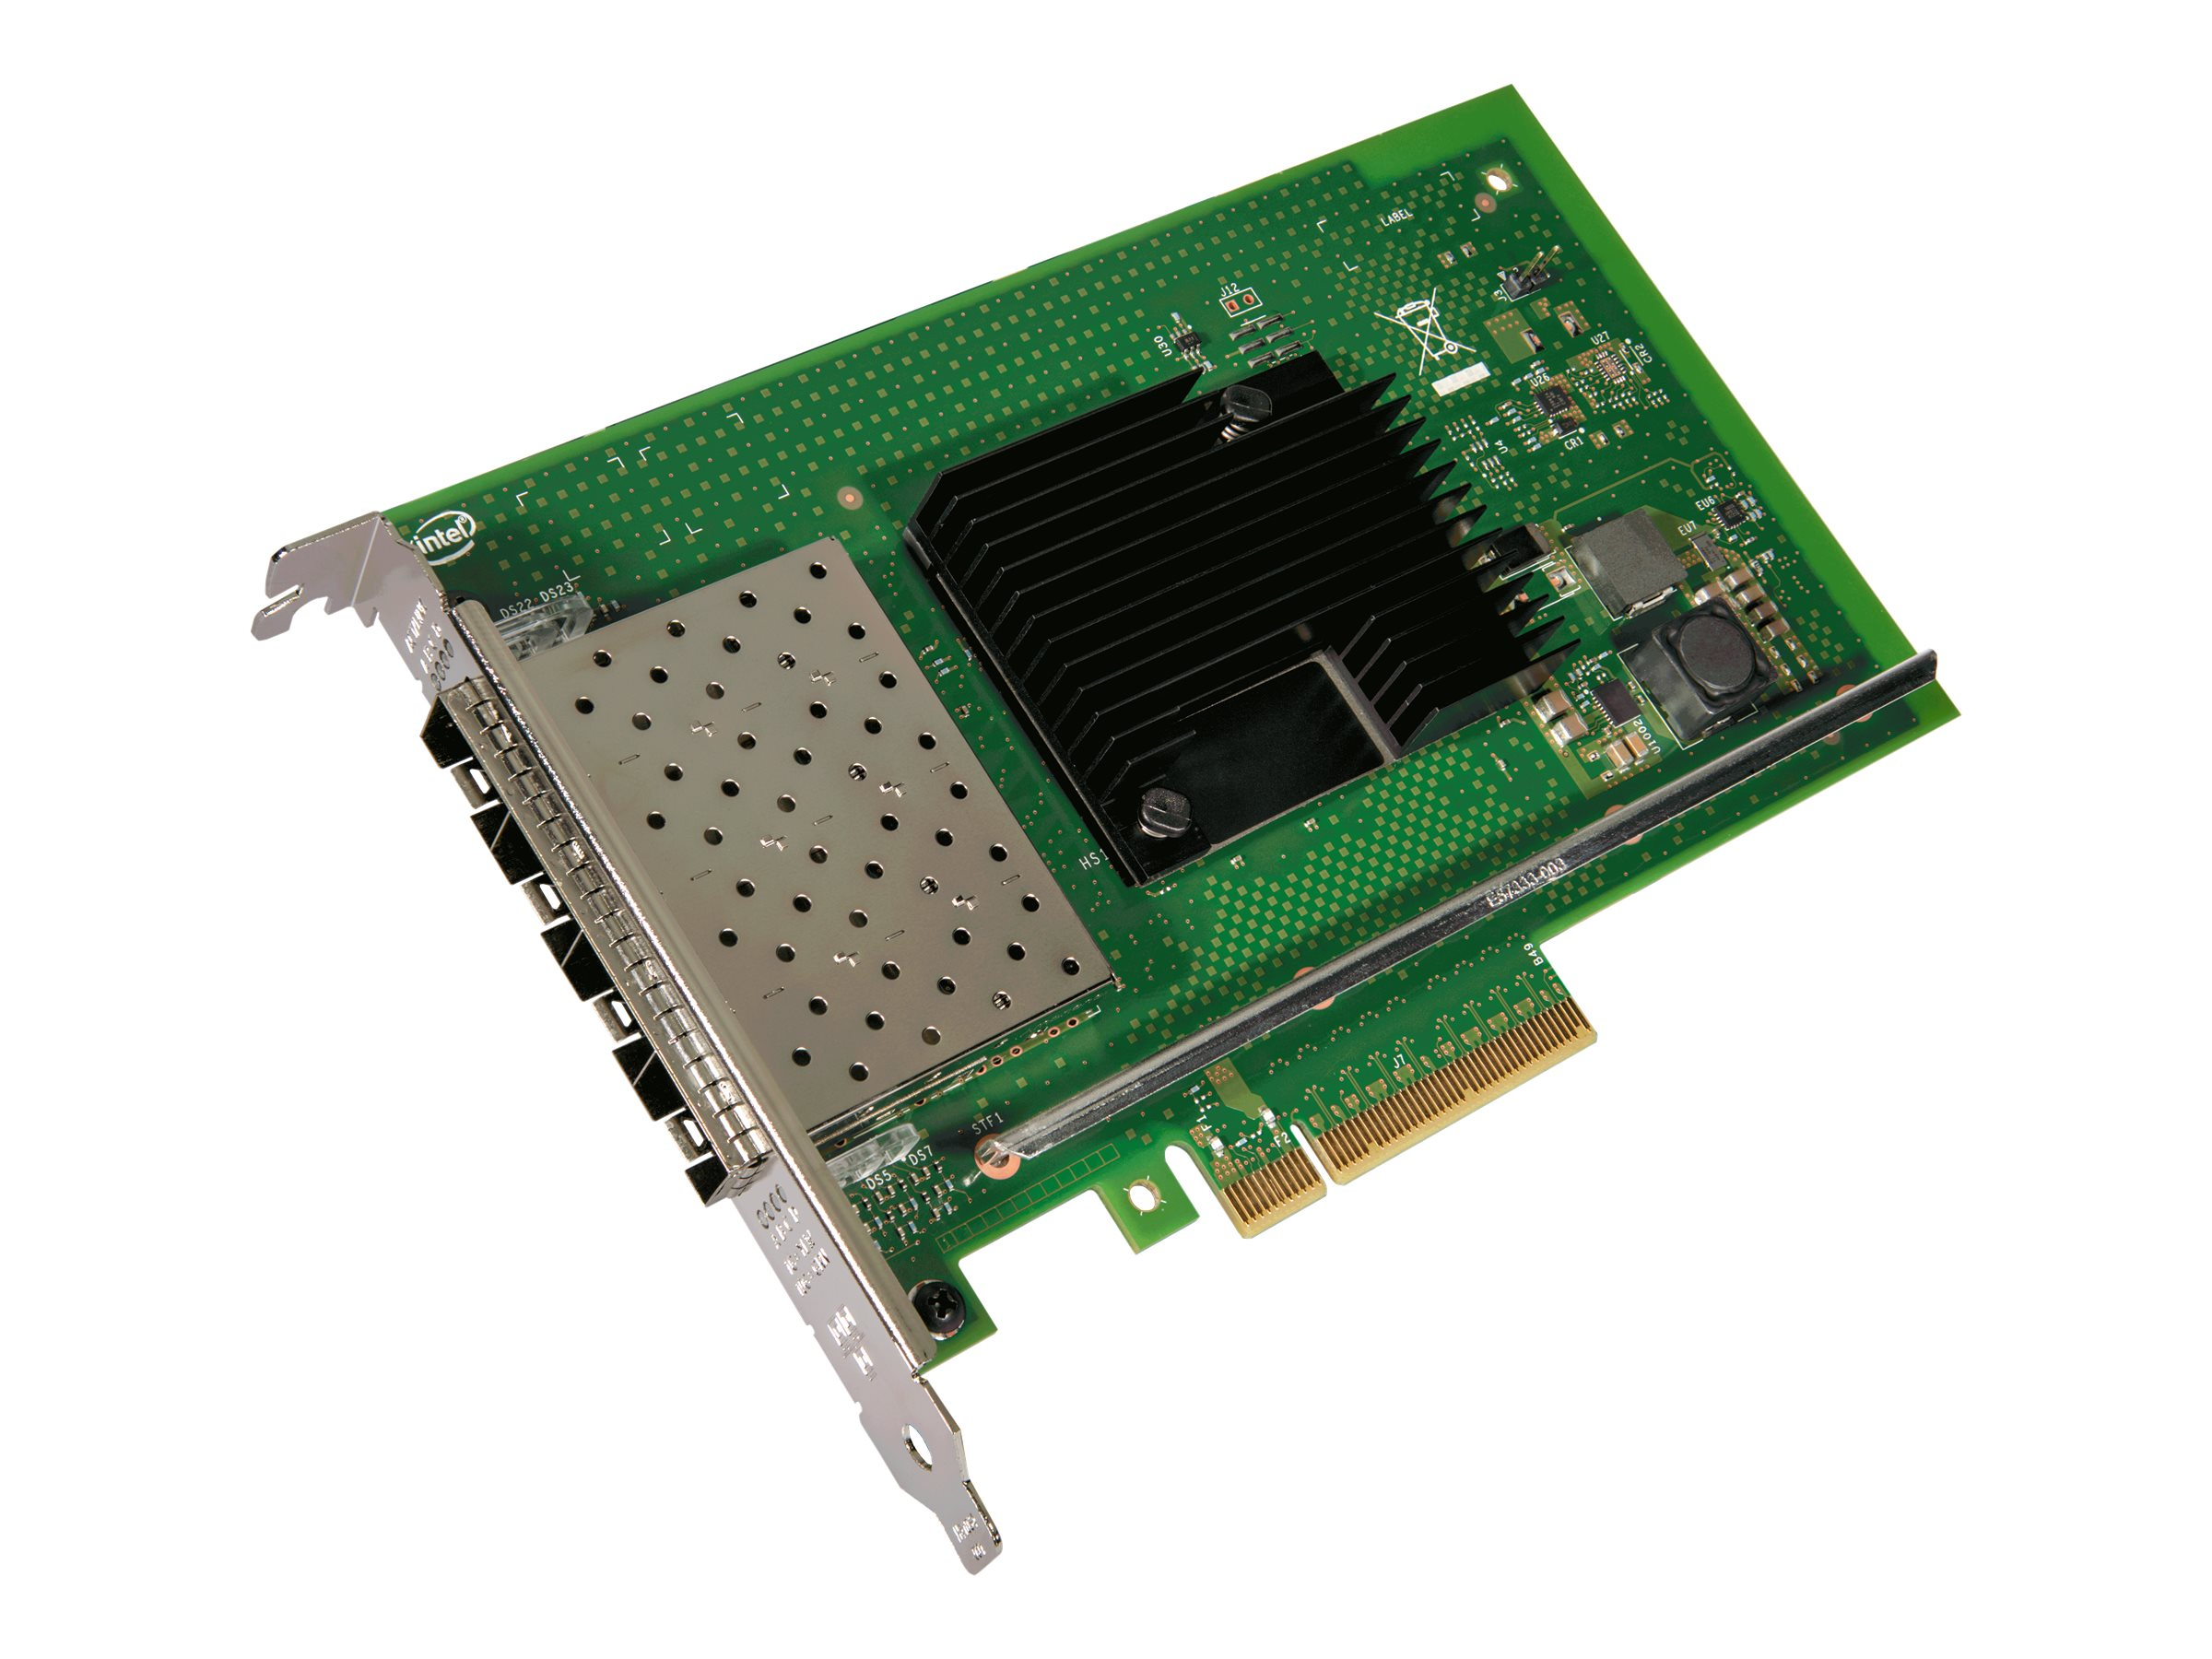 Intel Ethernet Converged Network Adapter X710-DA4 - network adapter - PCIe 3.0 x8 - 10 Gigabit SFP+ x 4